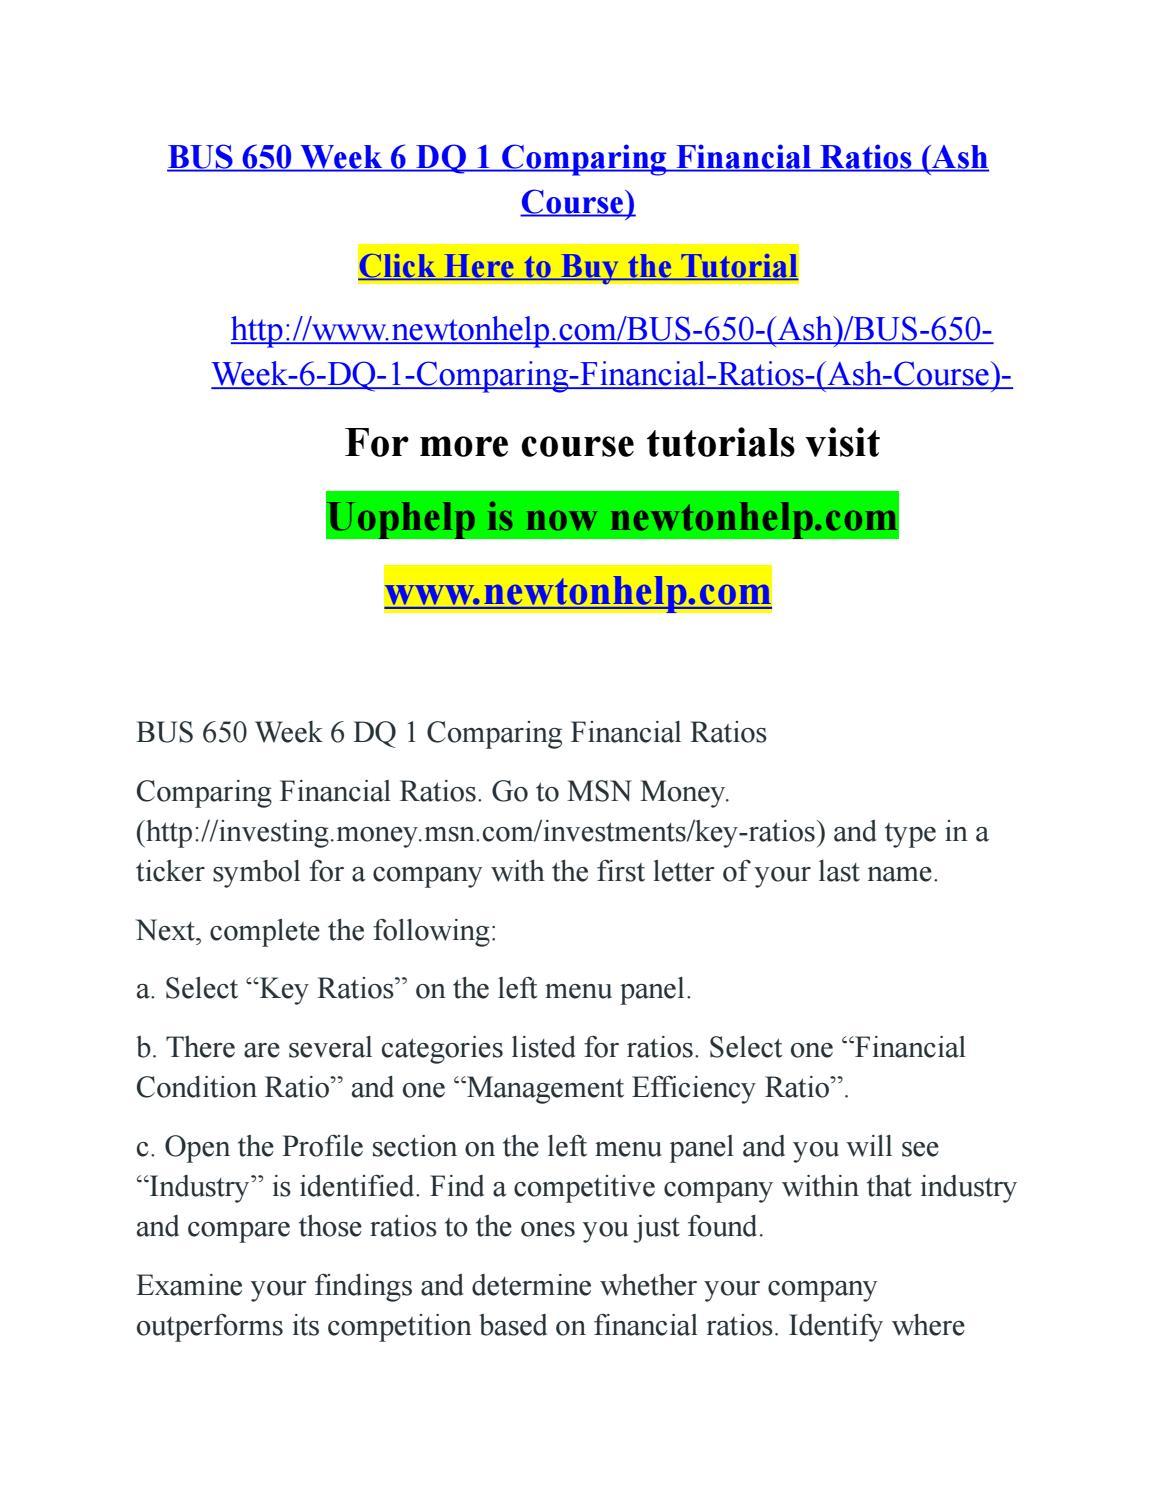 Bus 650 week 6 dq 1 comparing financial ratios (ash course